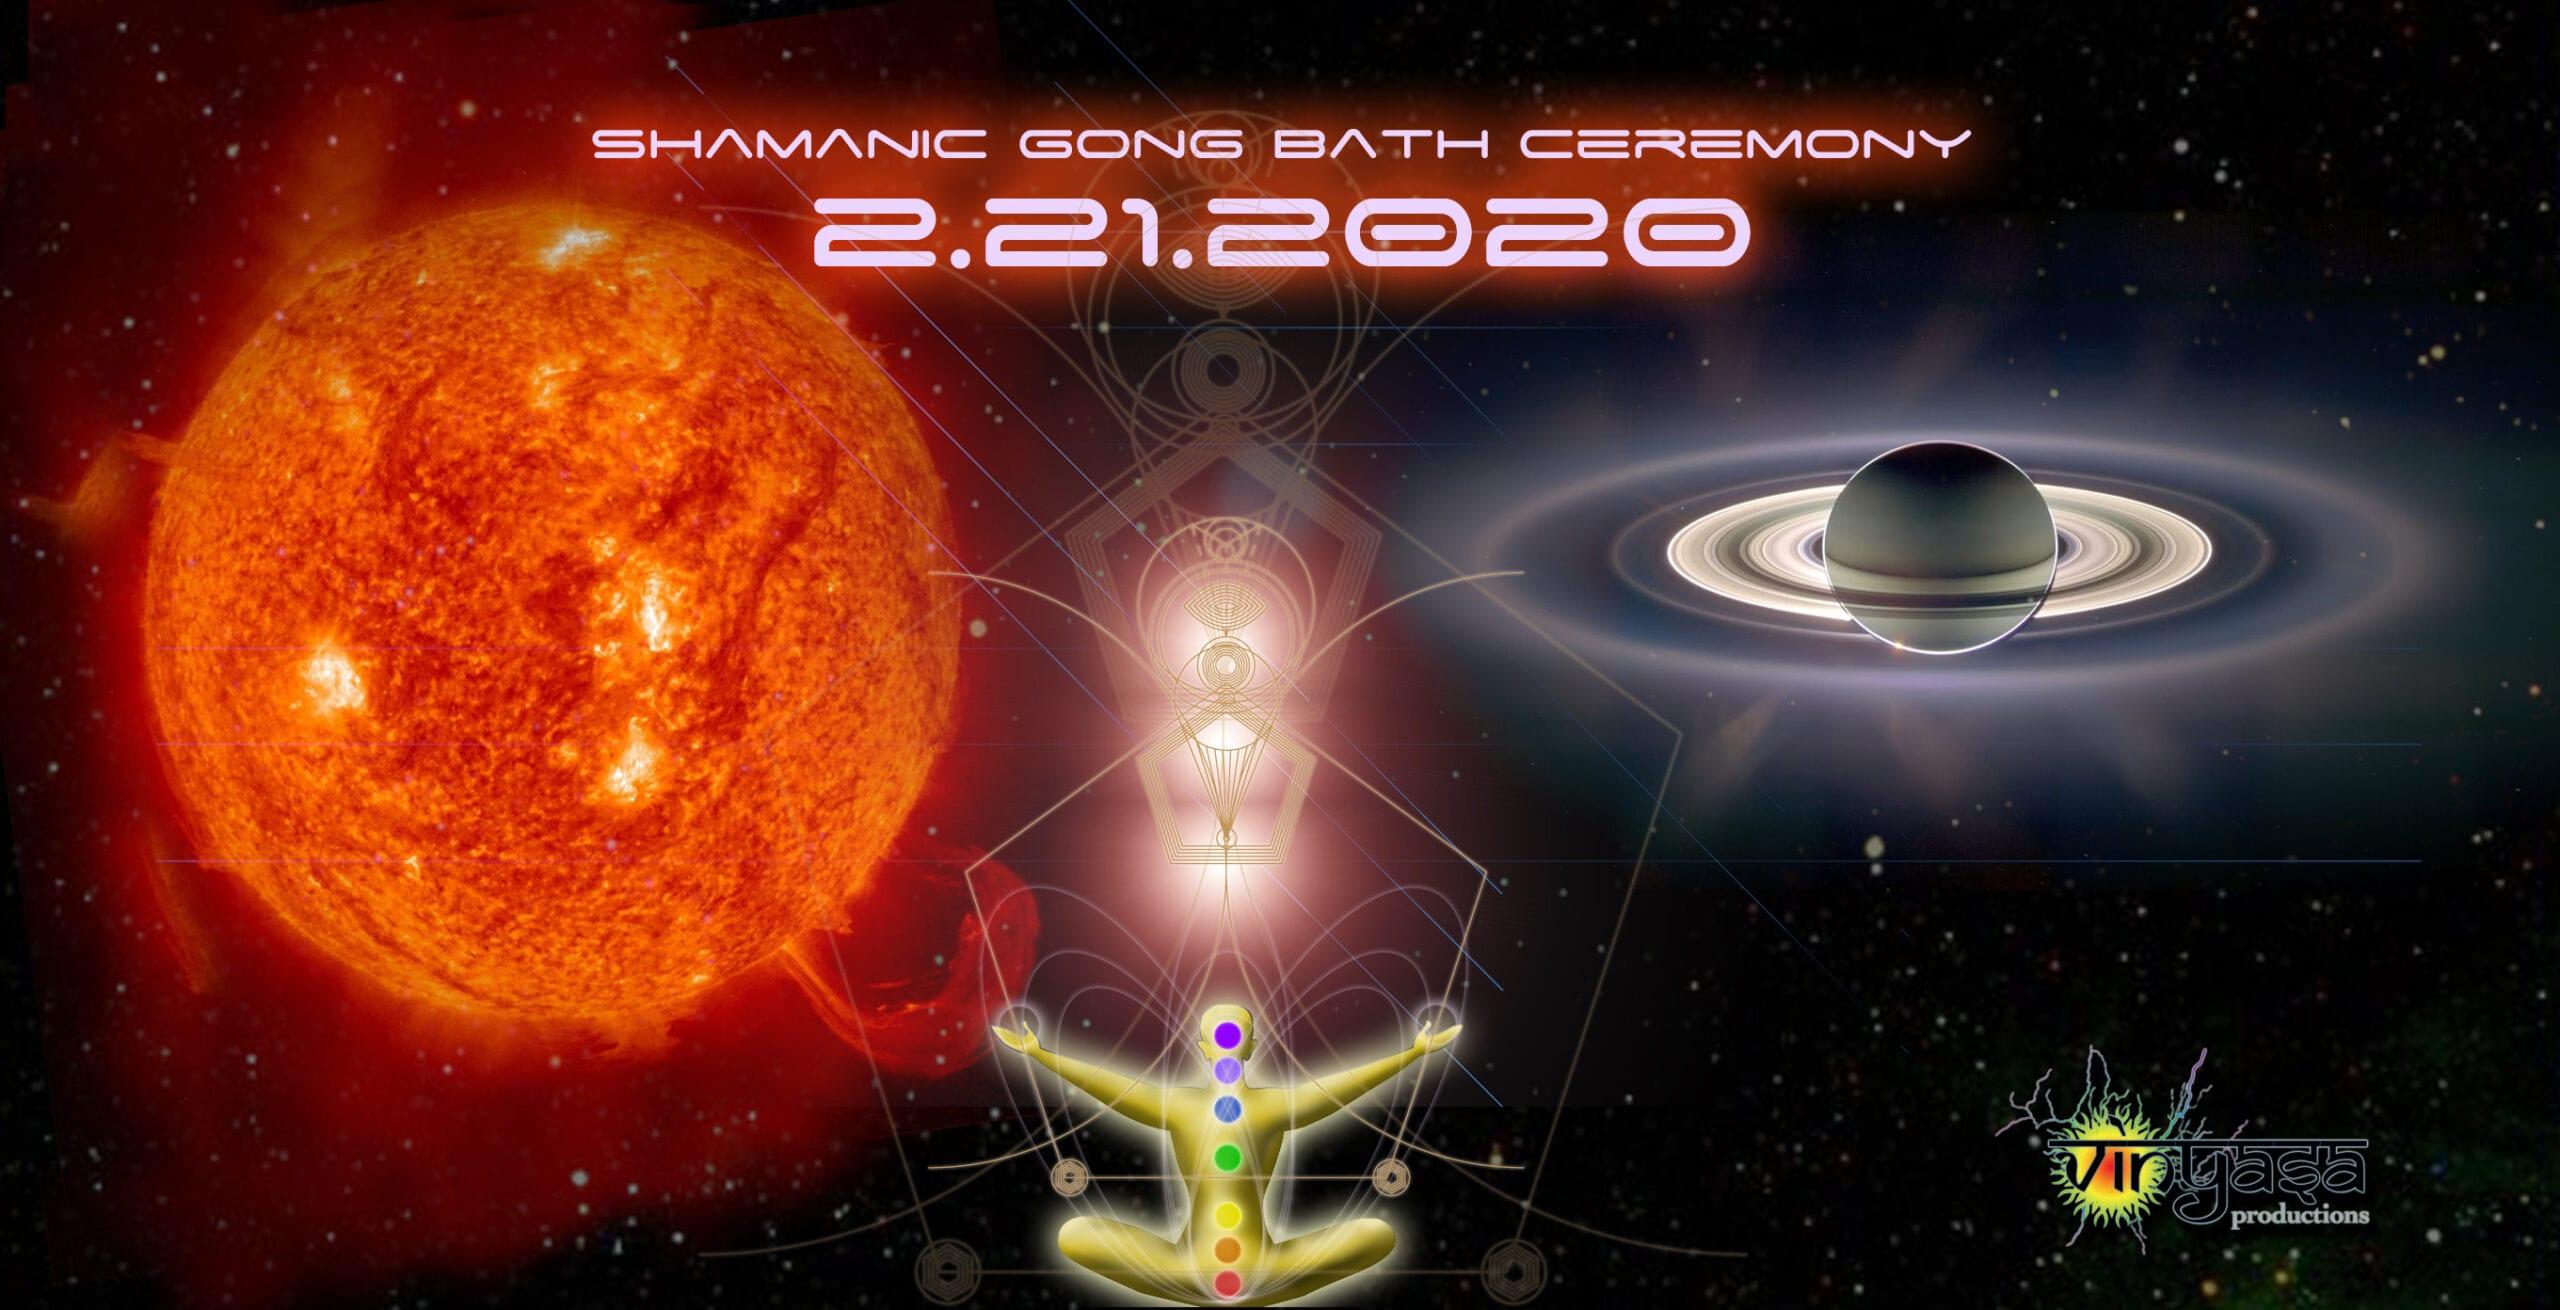 February 21, 2020 Gong Bath